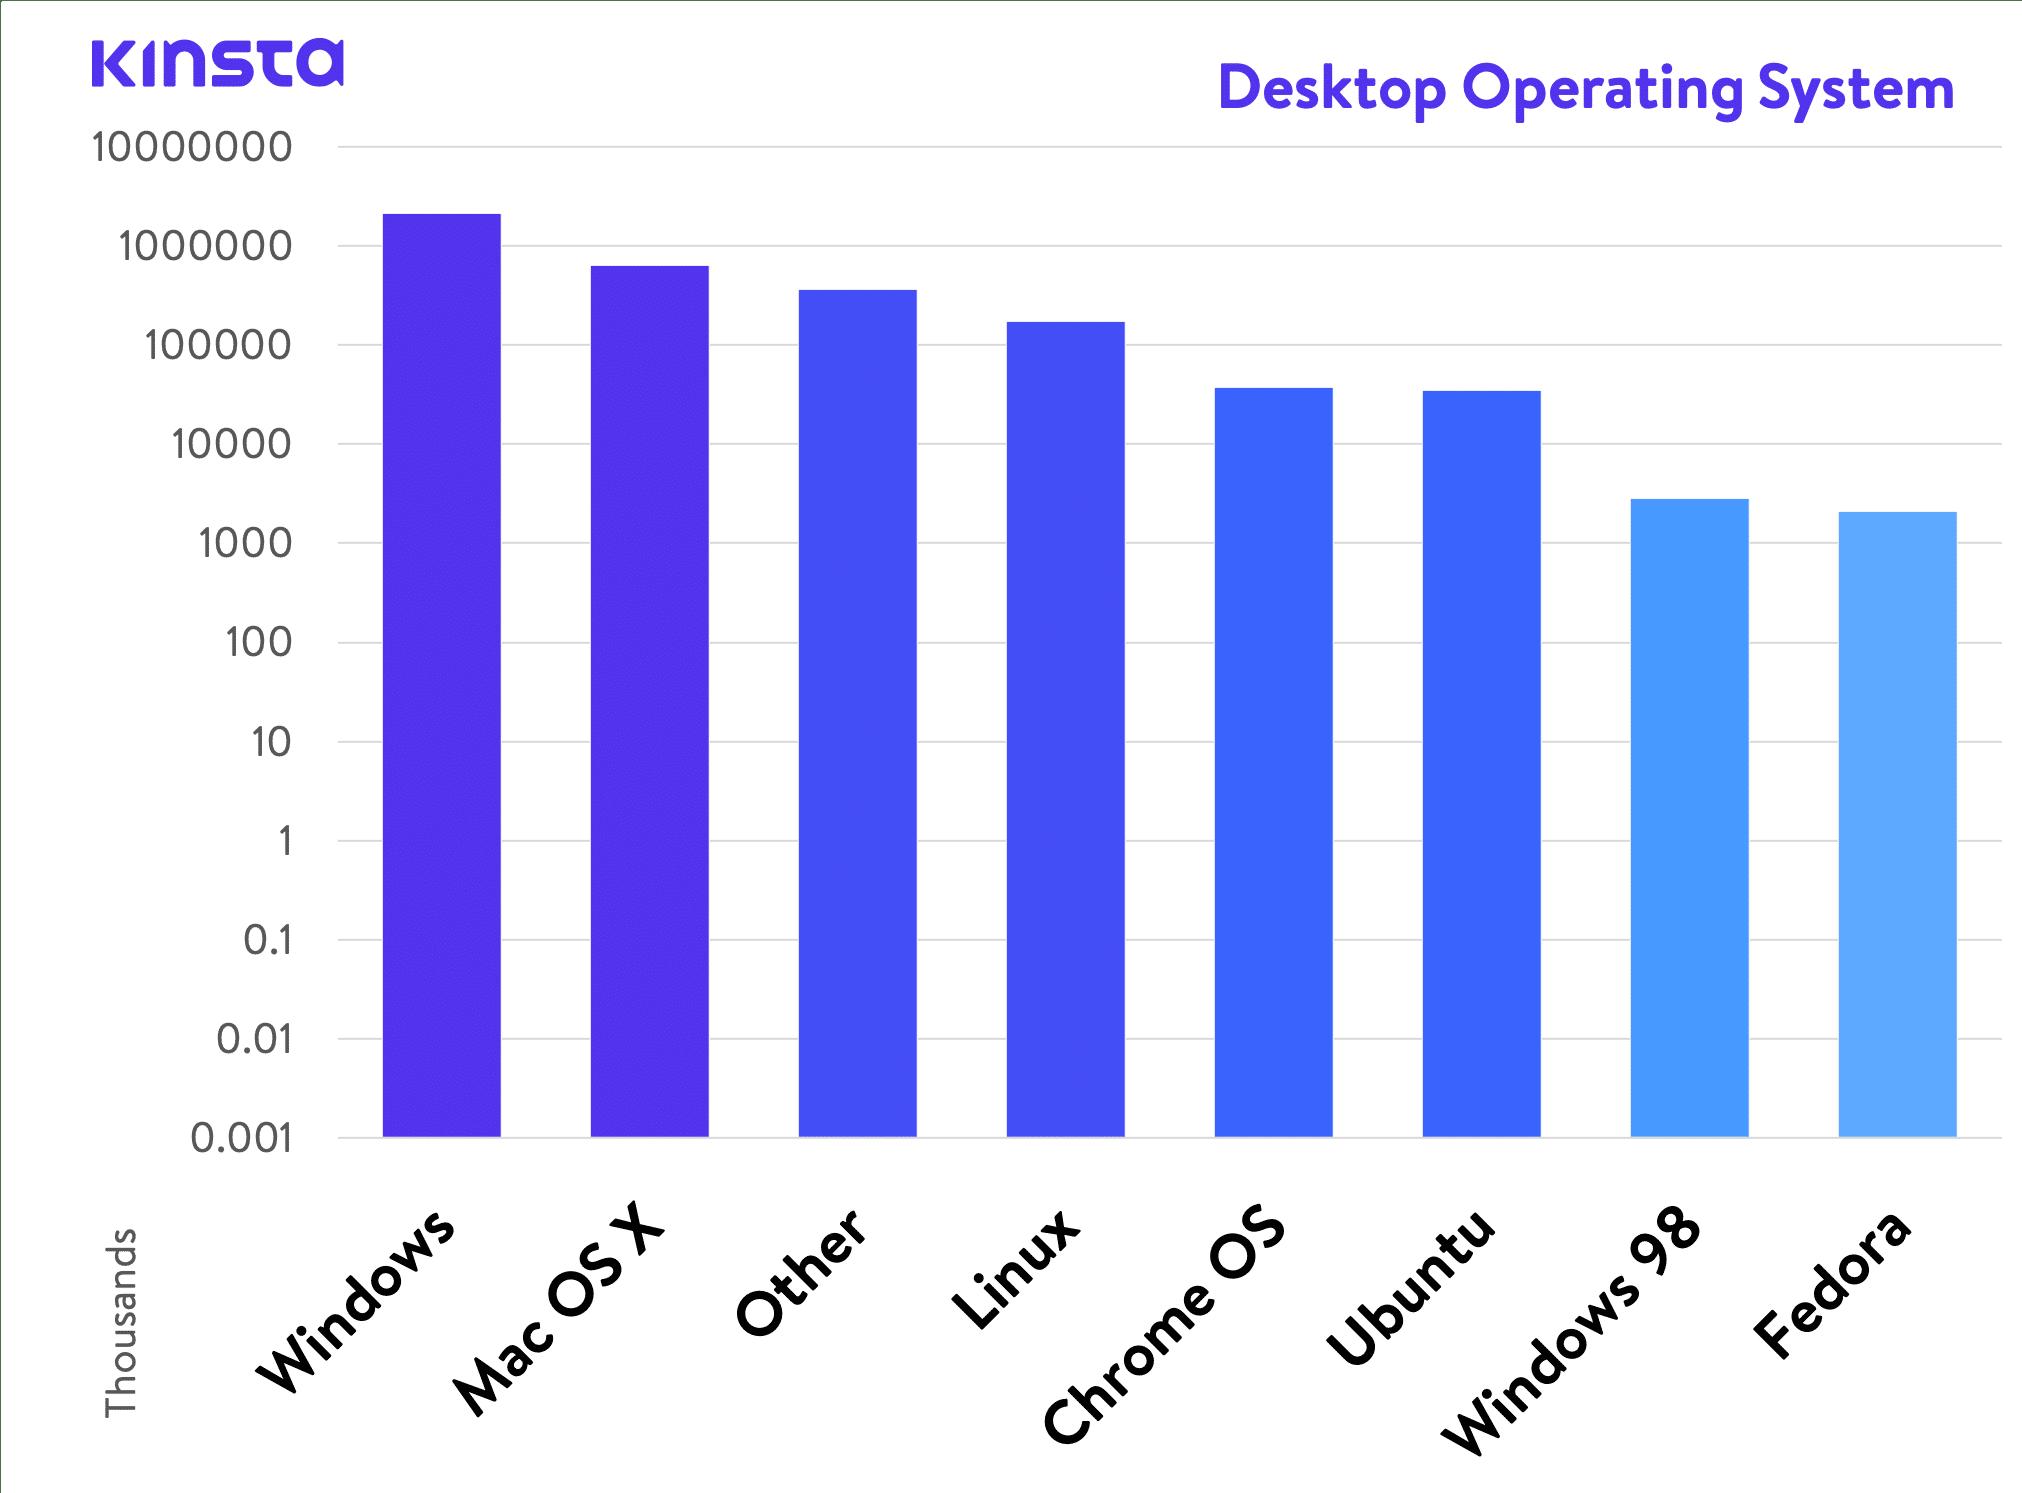 Sistema Operativo Desktop